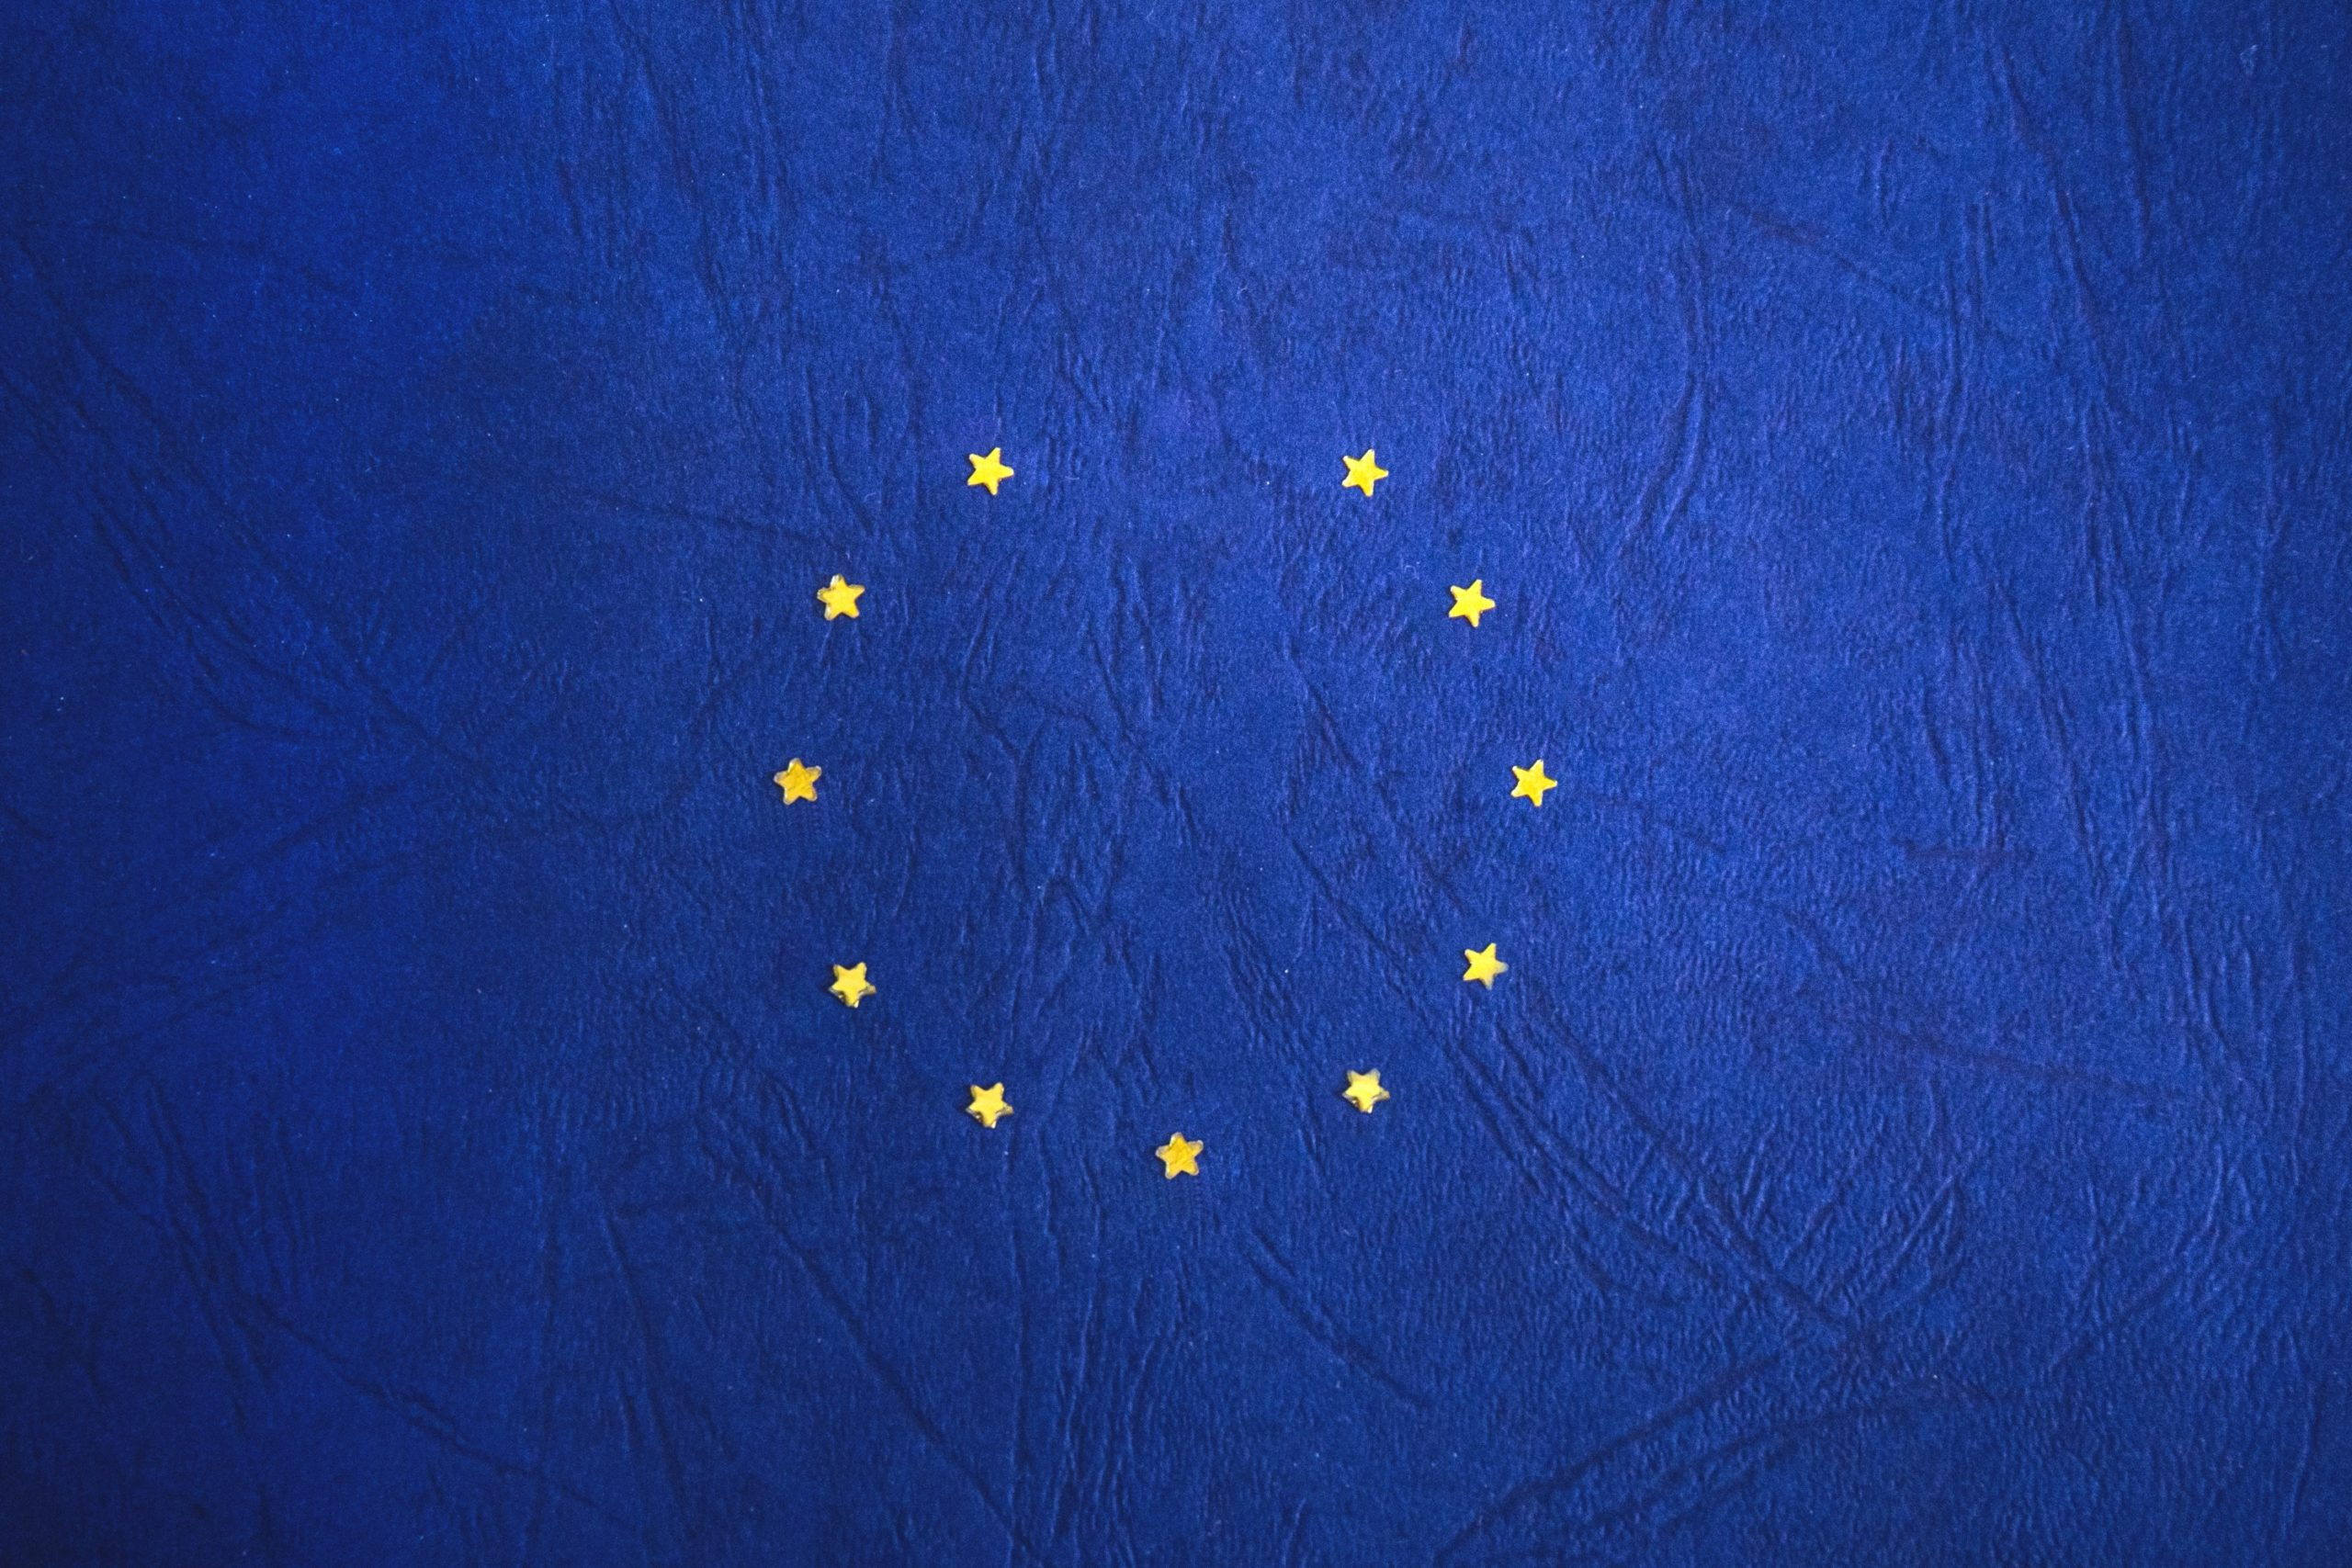 Auge-legal-fiscal-blog-andorra-union-europea